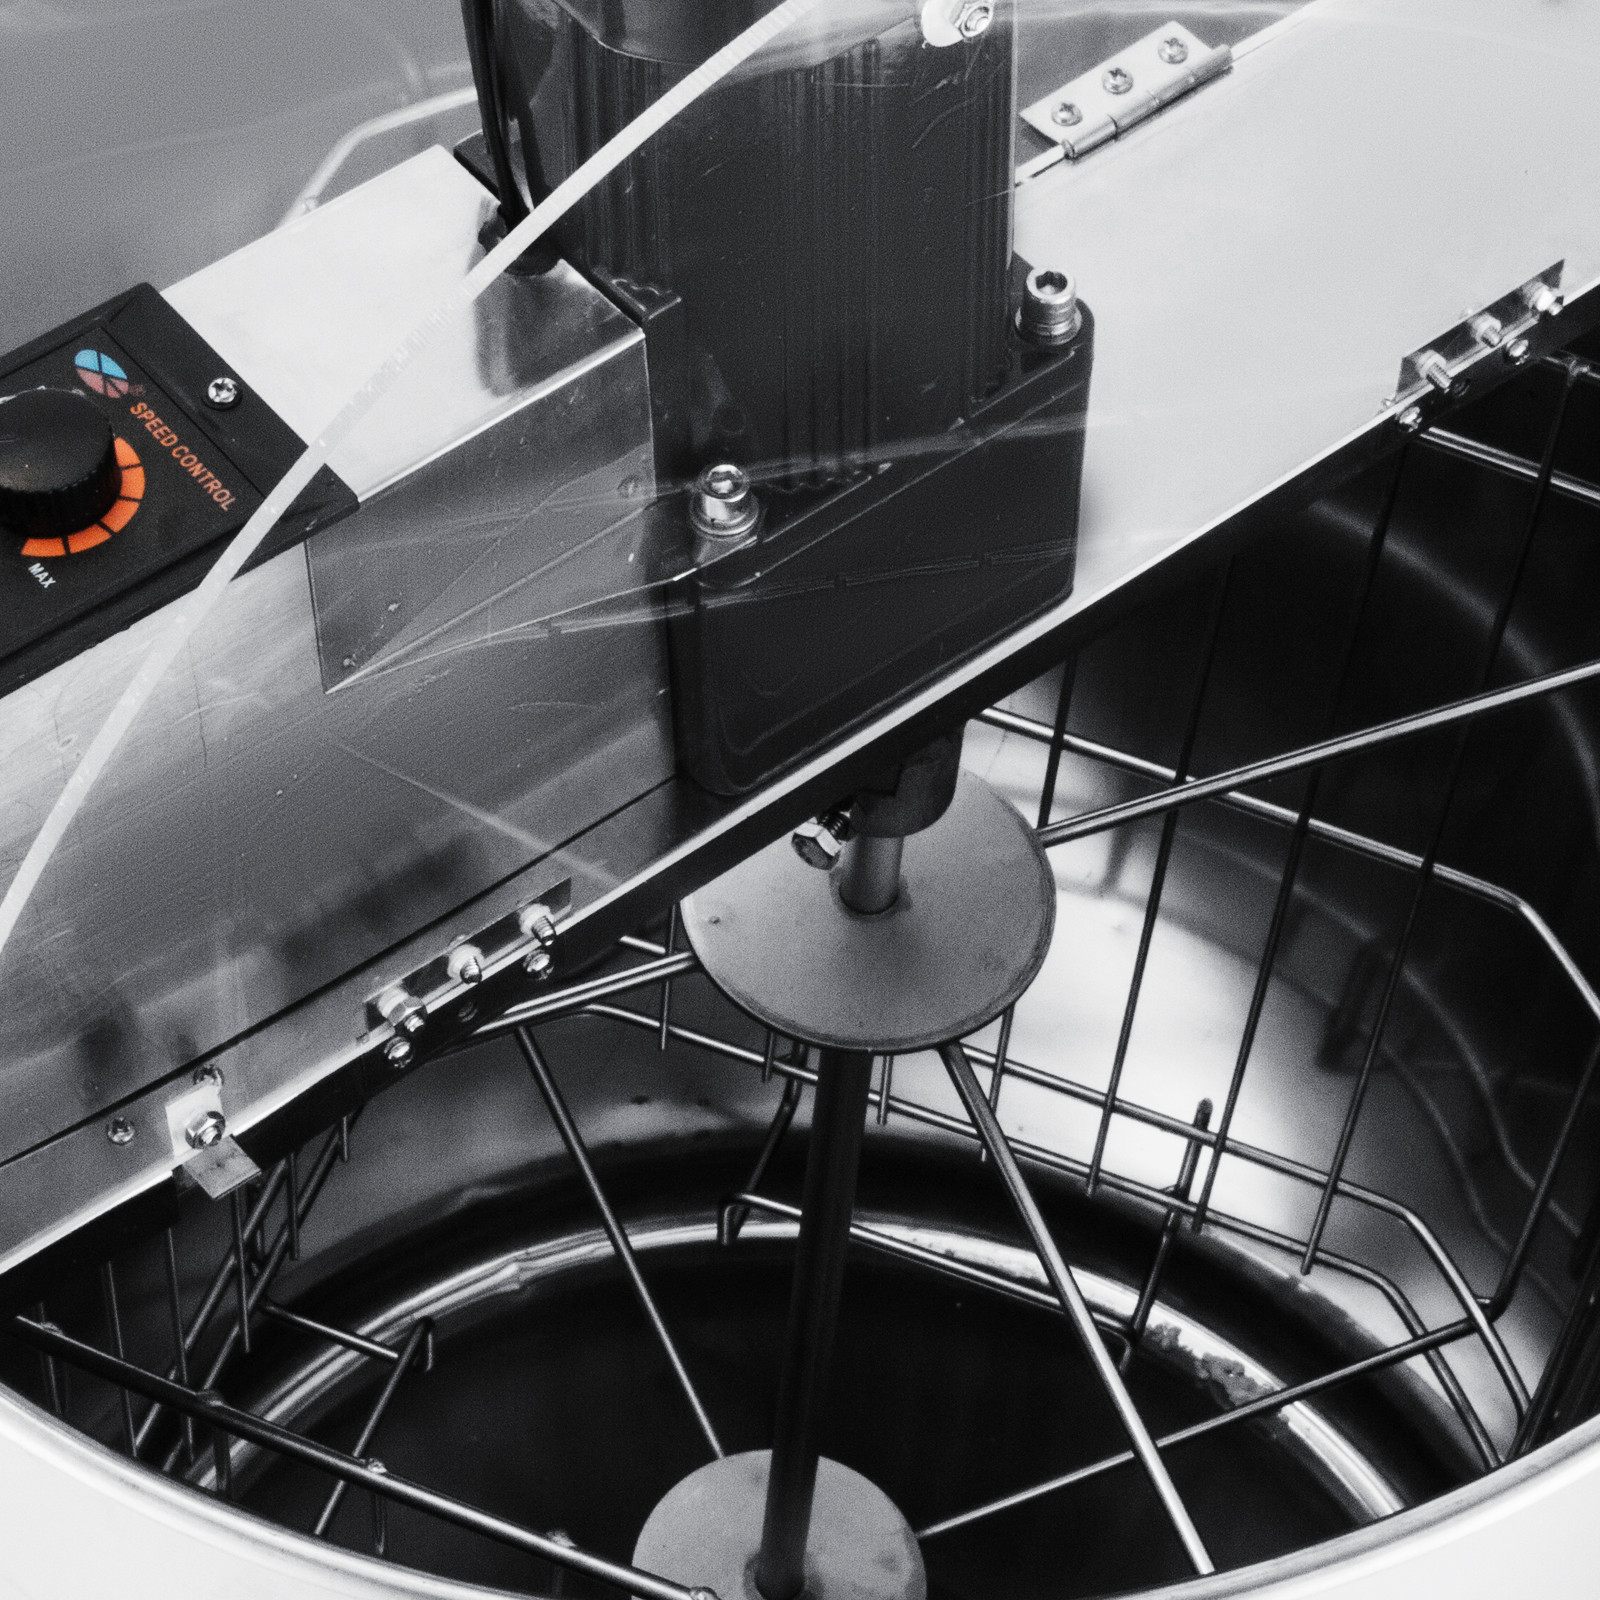 Extracteur-de-Miel-Electrique-manuelle-2-3-4-Cadres-En-Acier-Inox-Centrifugeuse miniature 67